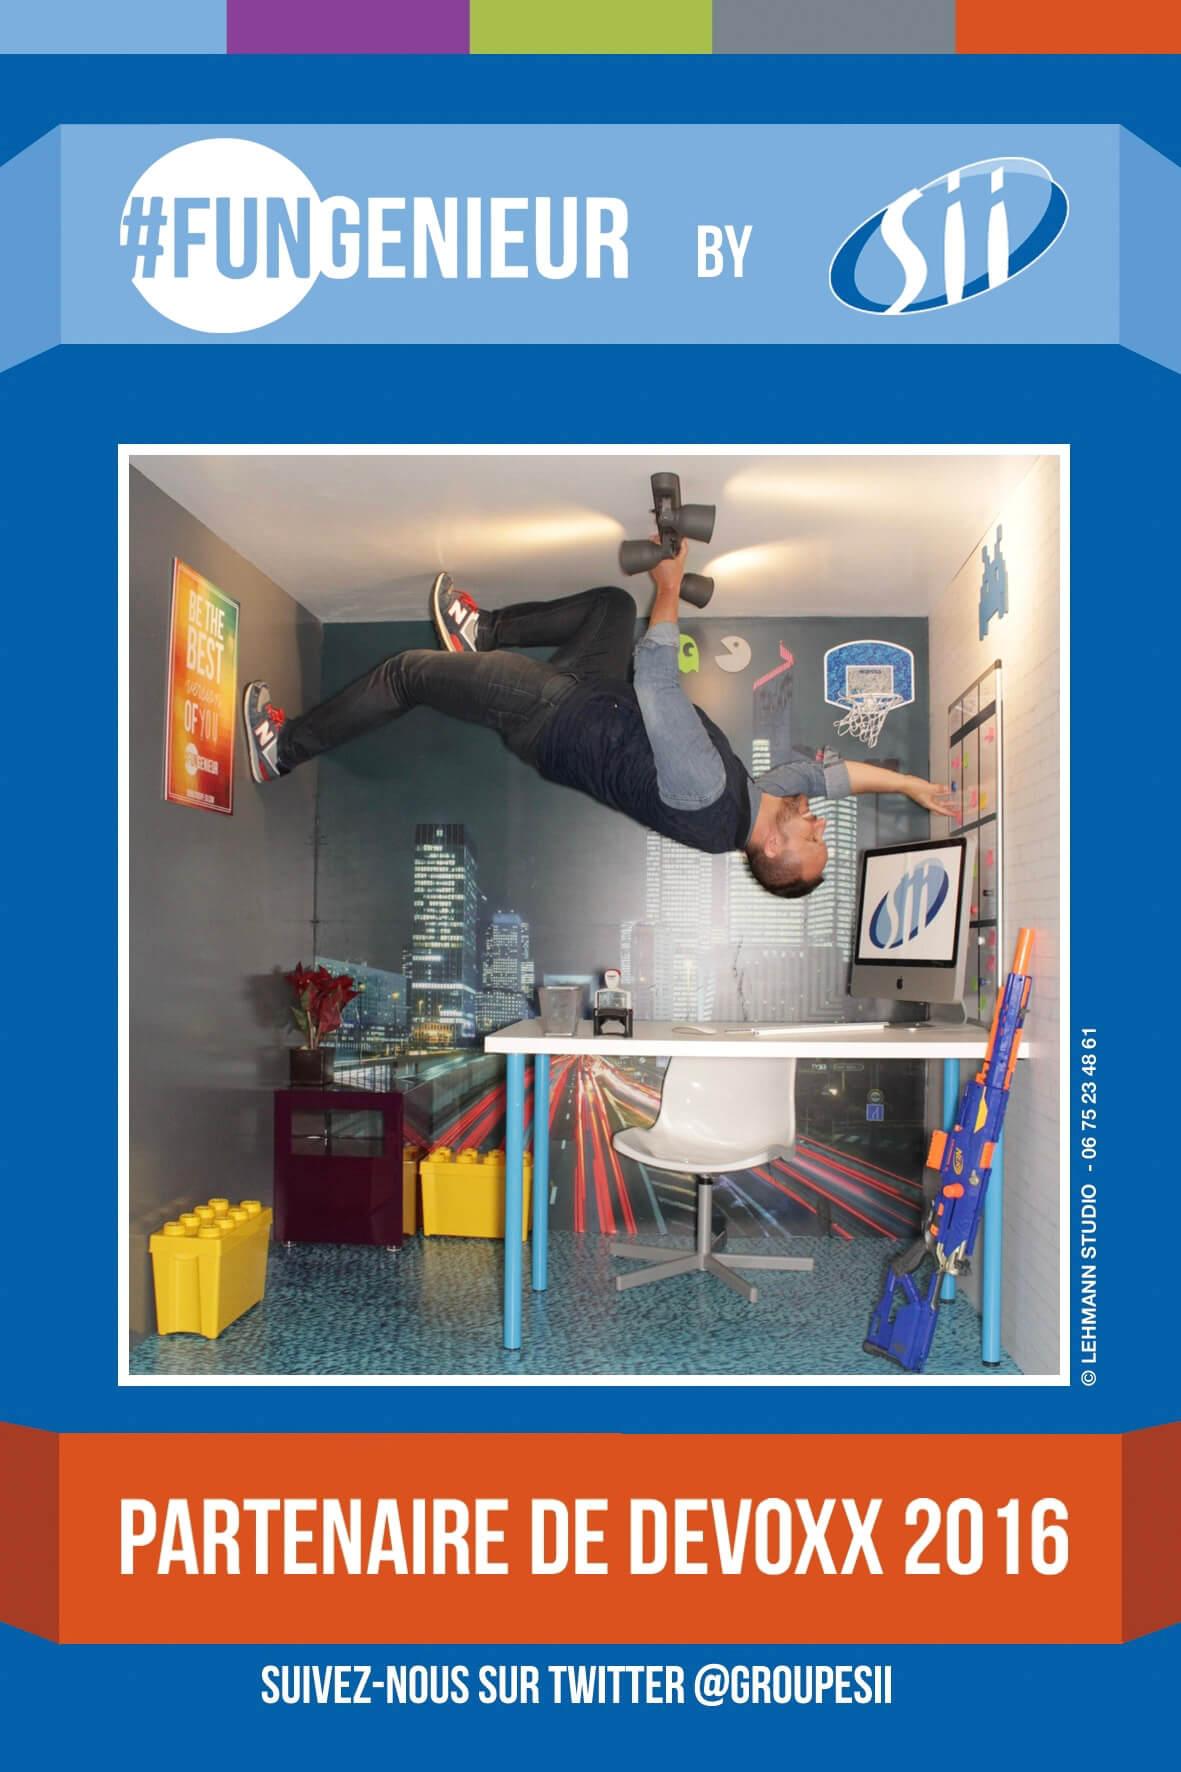 lehman-studio-photographe-angers-evenementiel-gravitybox-ambiance-bureau-sii